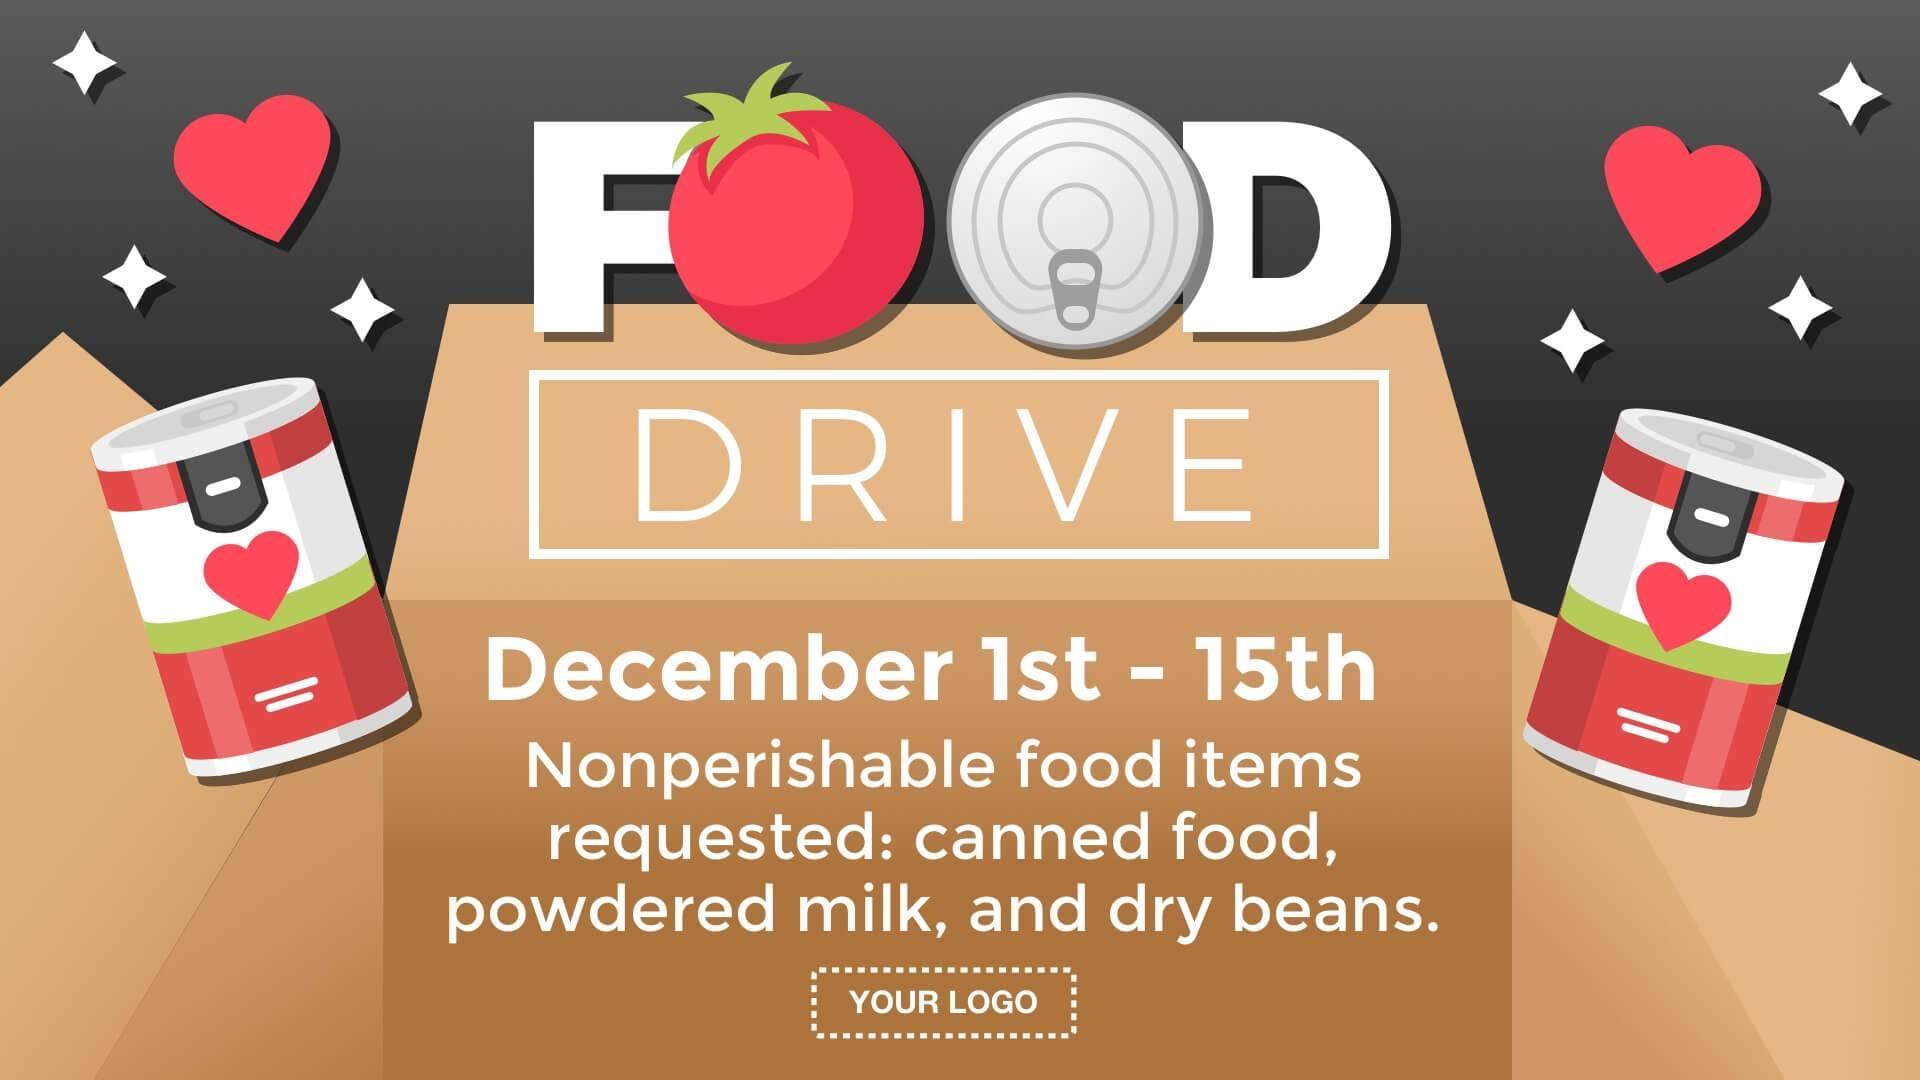 Food Drive Digital Signage Template